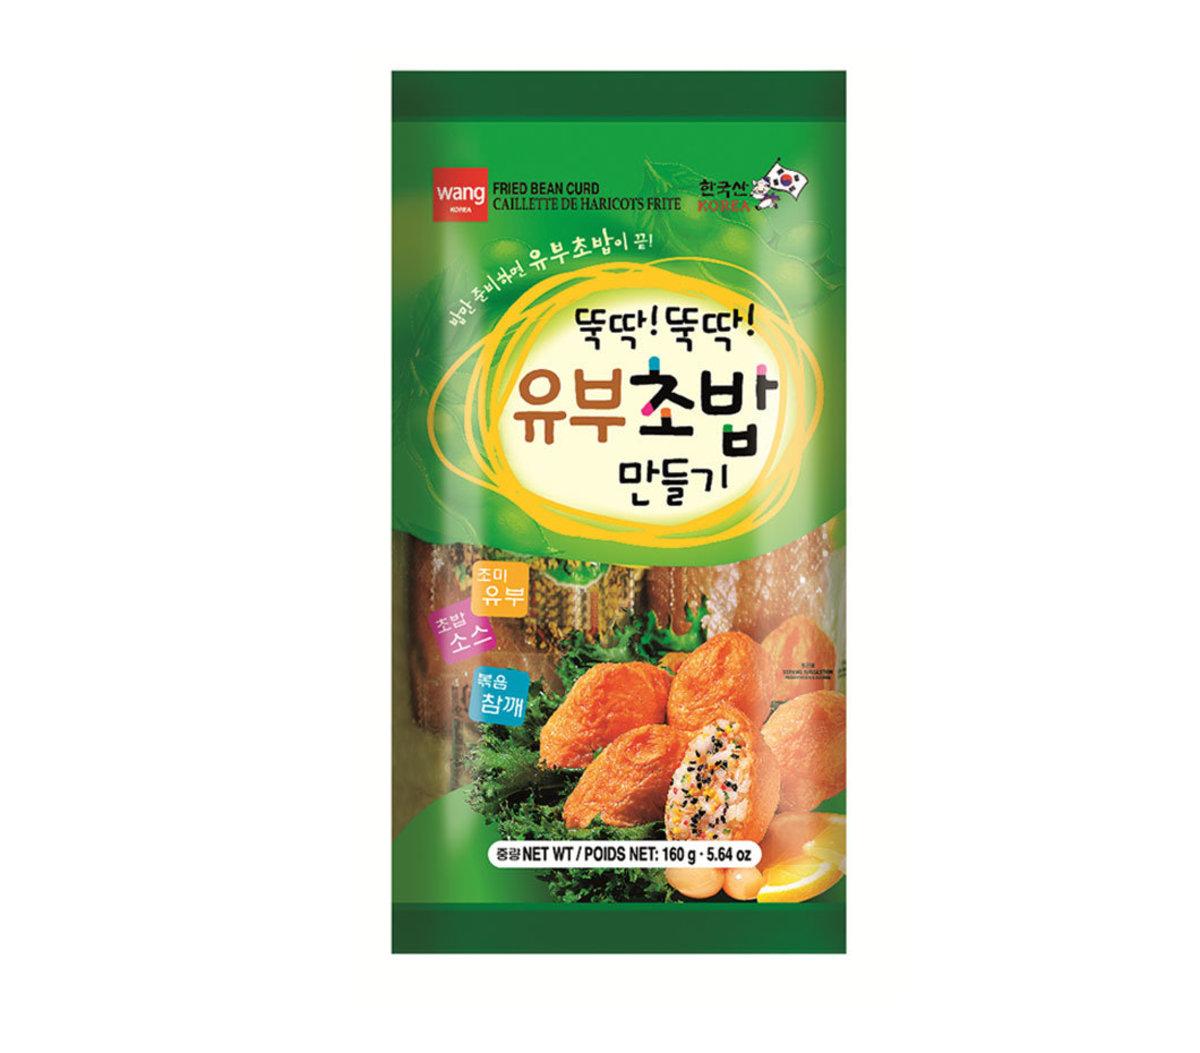 Fried Bean Curd韓國三角腐皮壽司材料包(2人份)